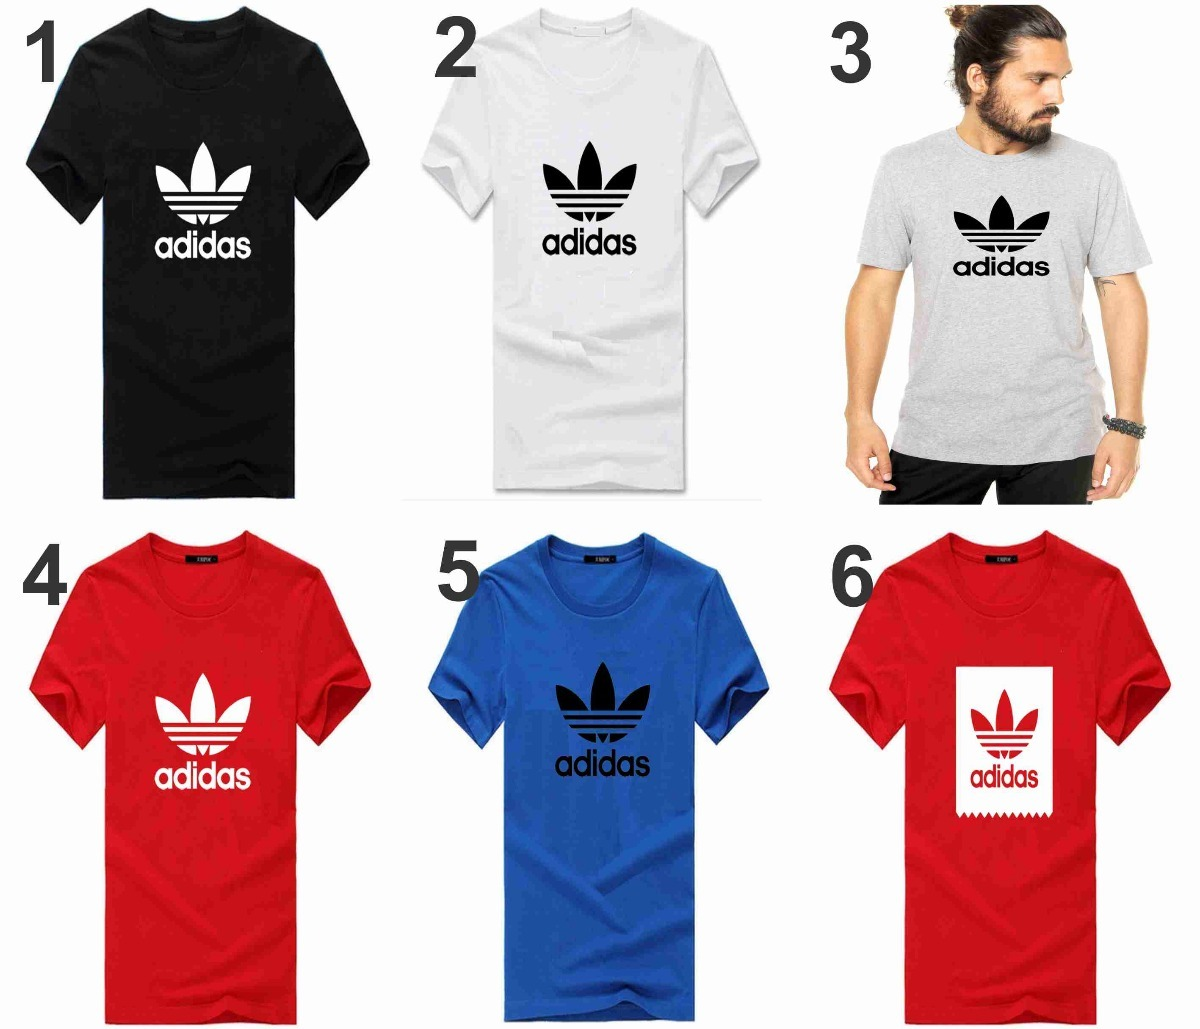 b11475dabc8 kit 5 camiseta masculina camisa blusa barata de marca oferta. Carregando  zoom.